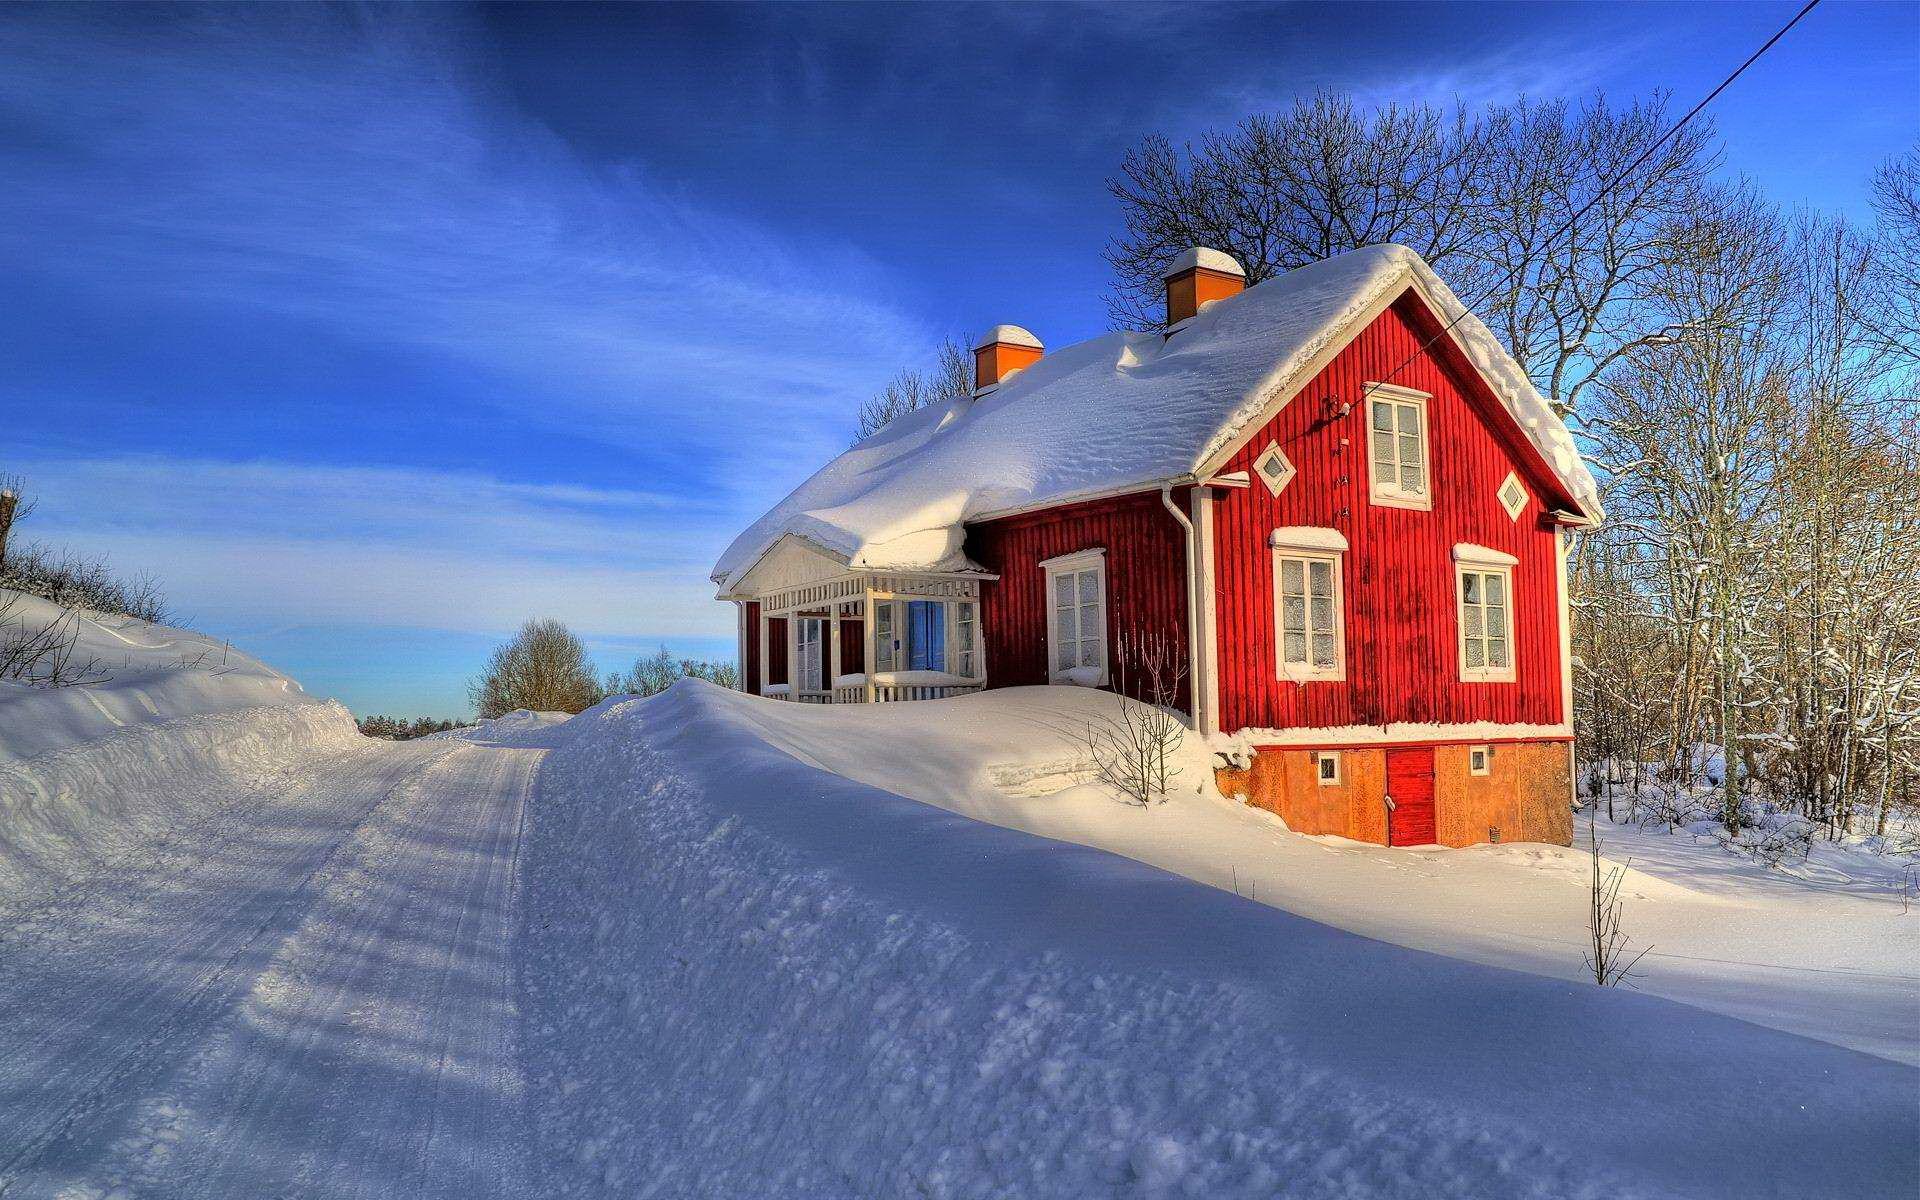 Swedish Women In Snow